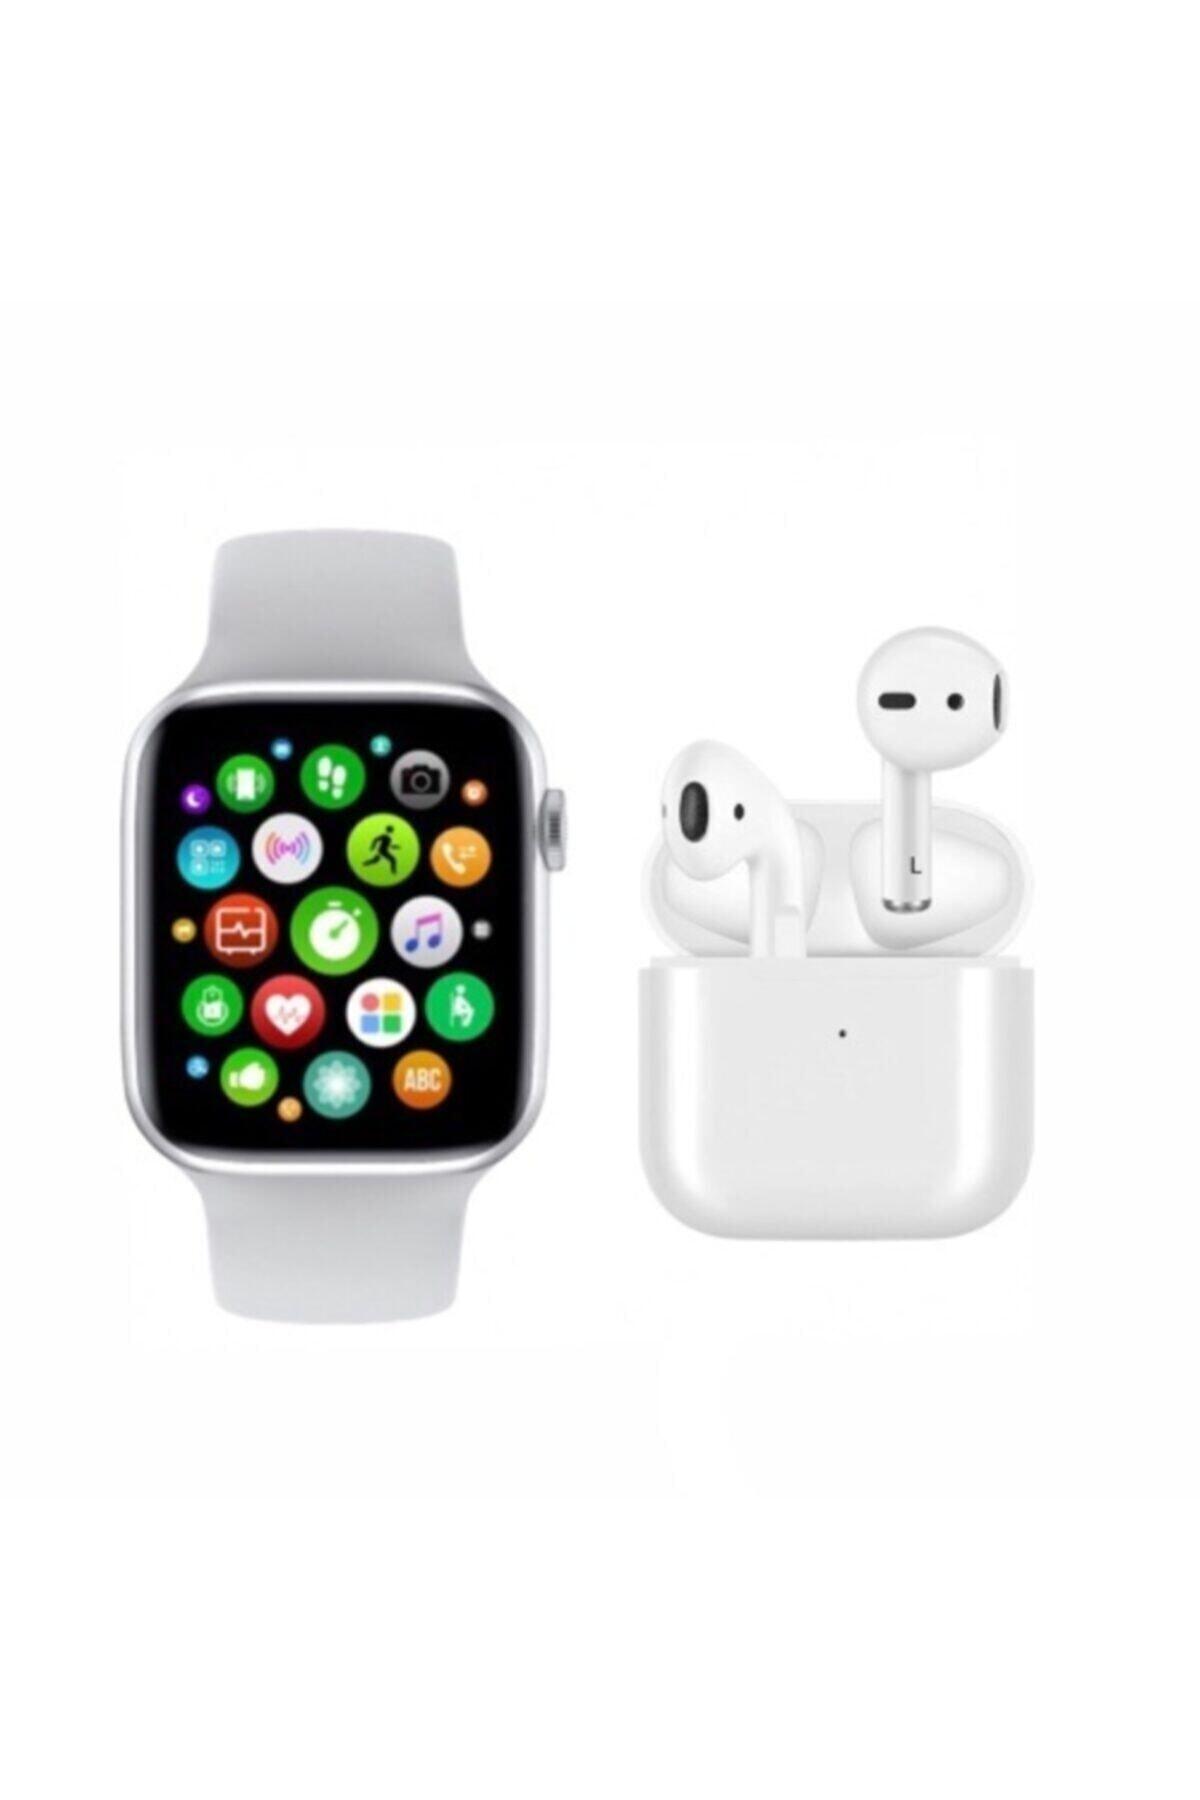 SmartWatch Akıllı Saat T500 ve Airpods Pro 4 Mini Kablosuz Kulaklık 1